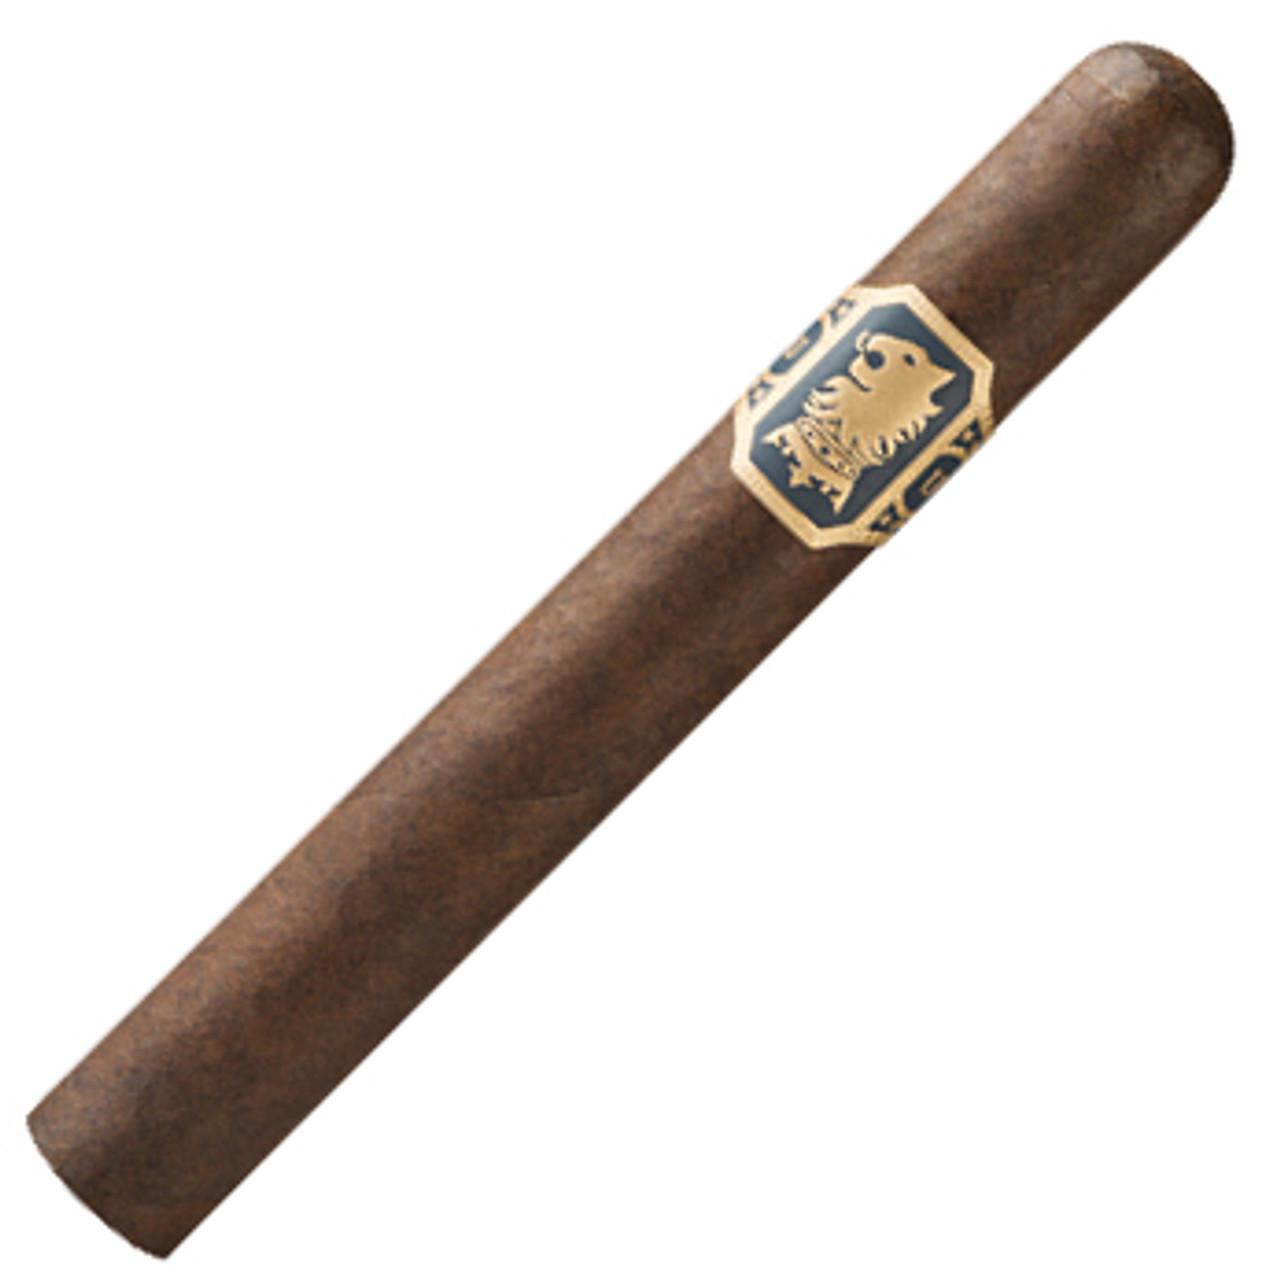 Undercrown Gran Toro Cigars - 6 x 52 (Box of 25)